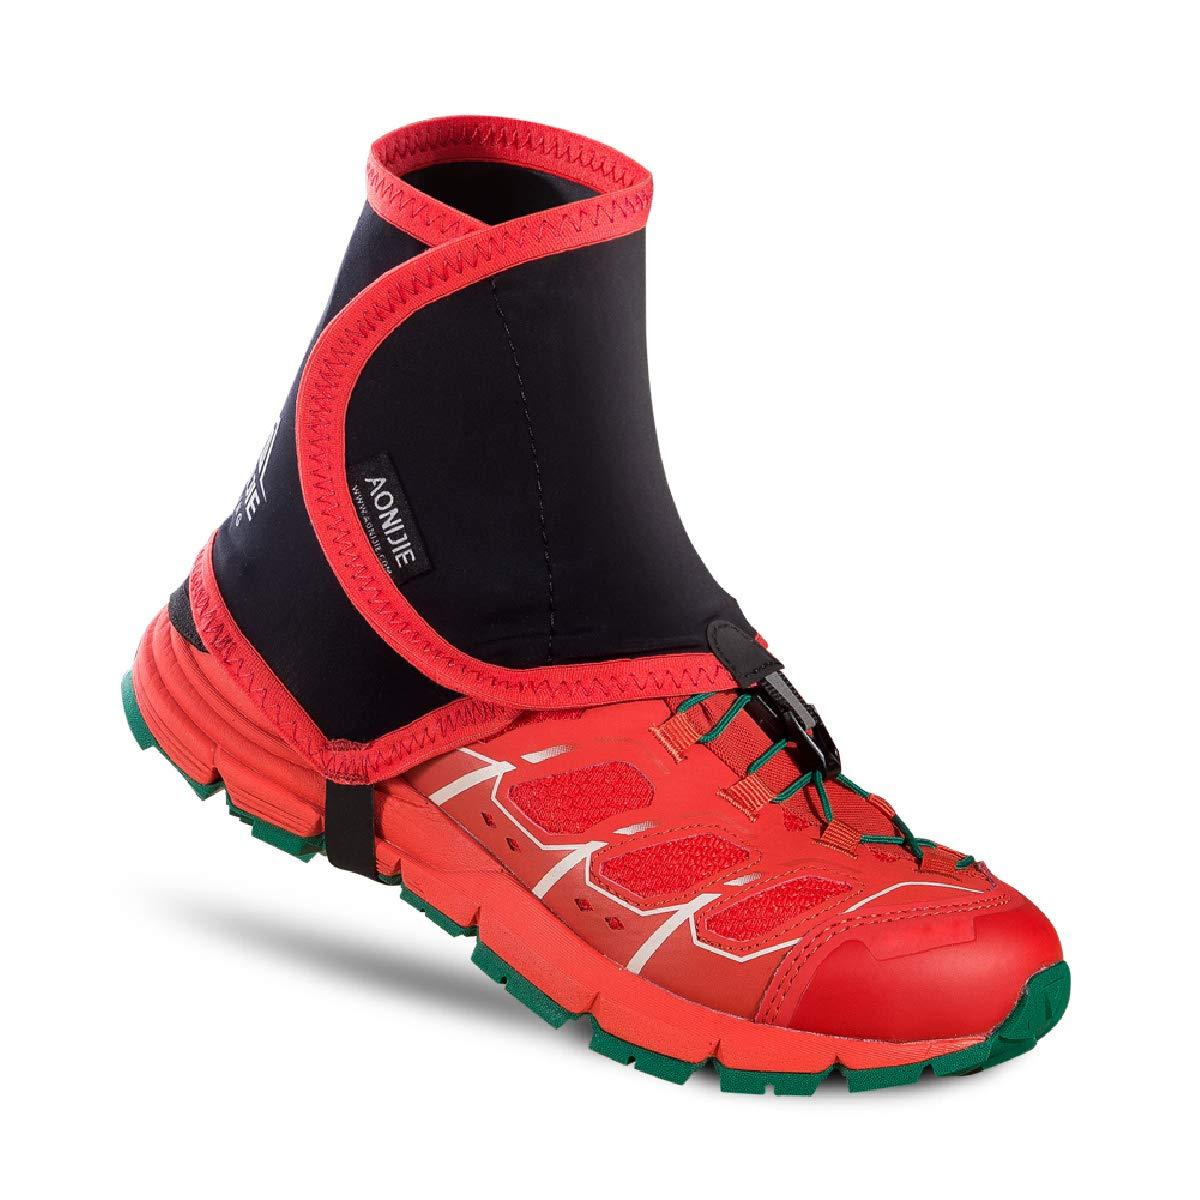 TRIWONDER Low Trail Gaiters Ankle Running Gaiters Wrapid Gators for Men Women (Red&Black)